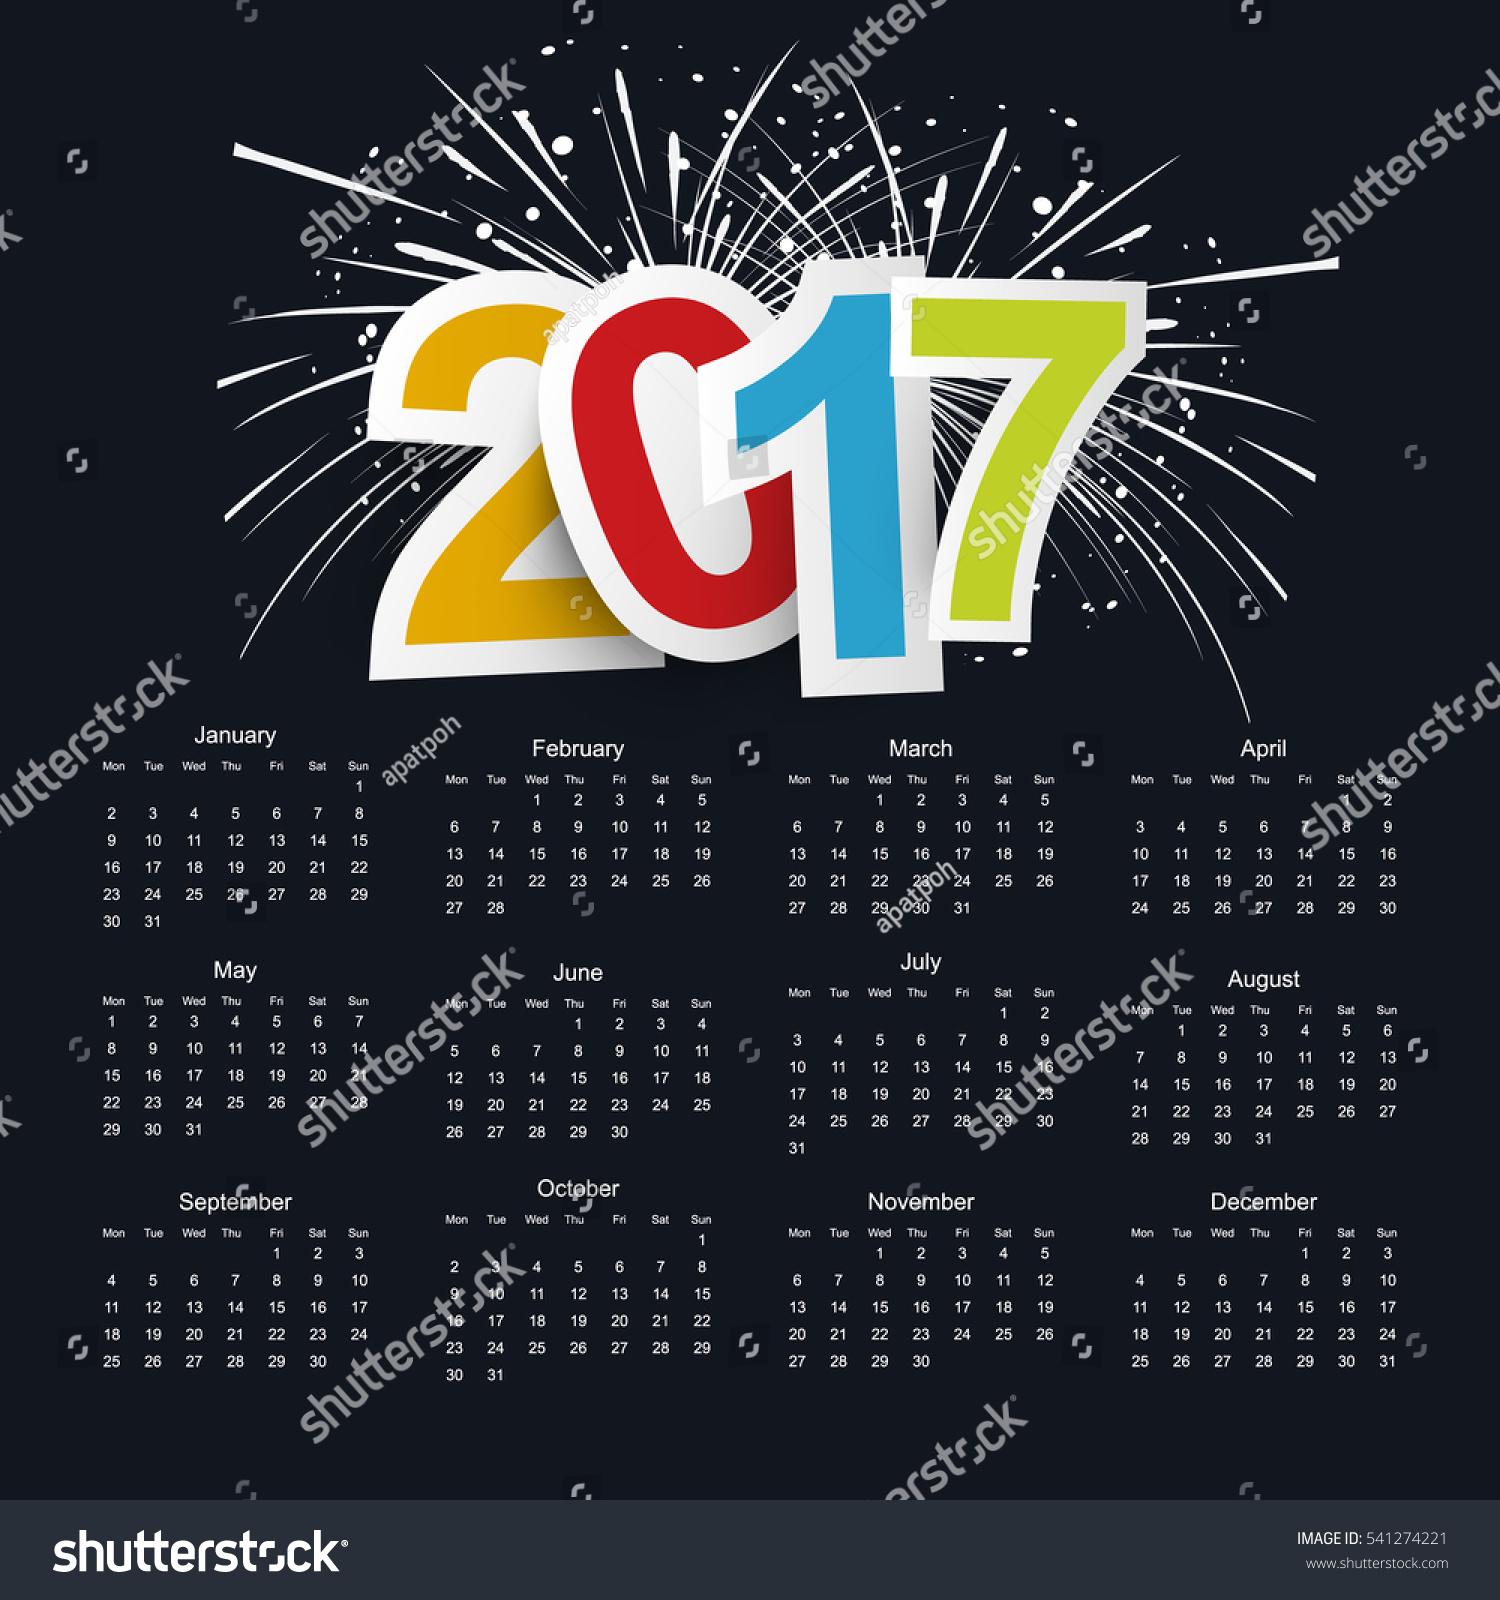 Calendar Background Vector : Calendar on black background stock vector